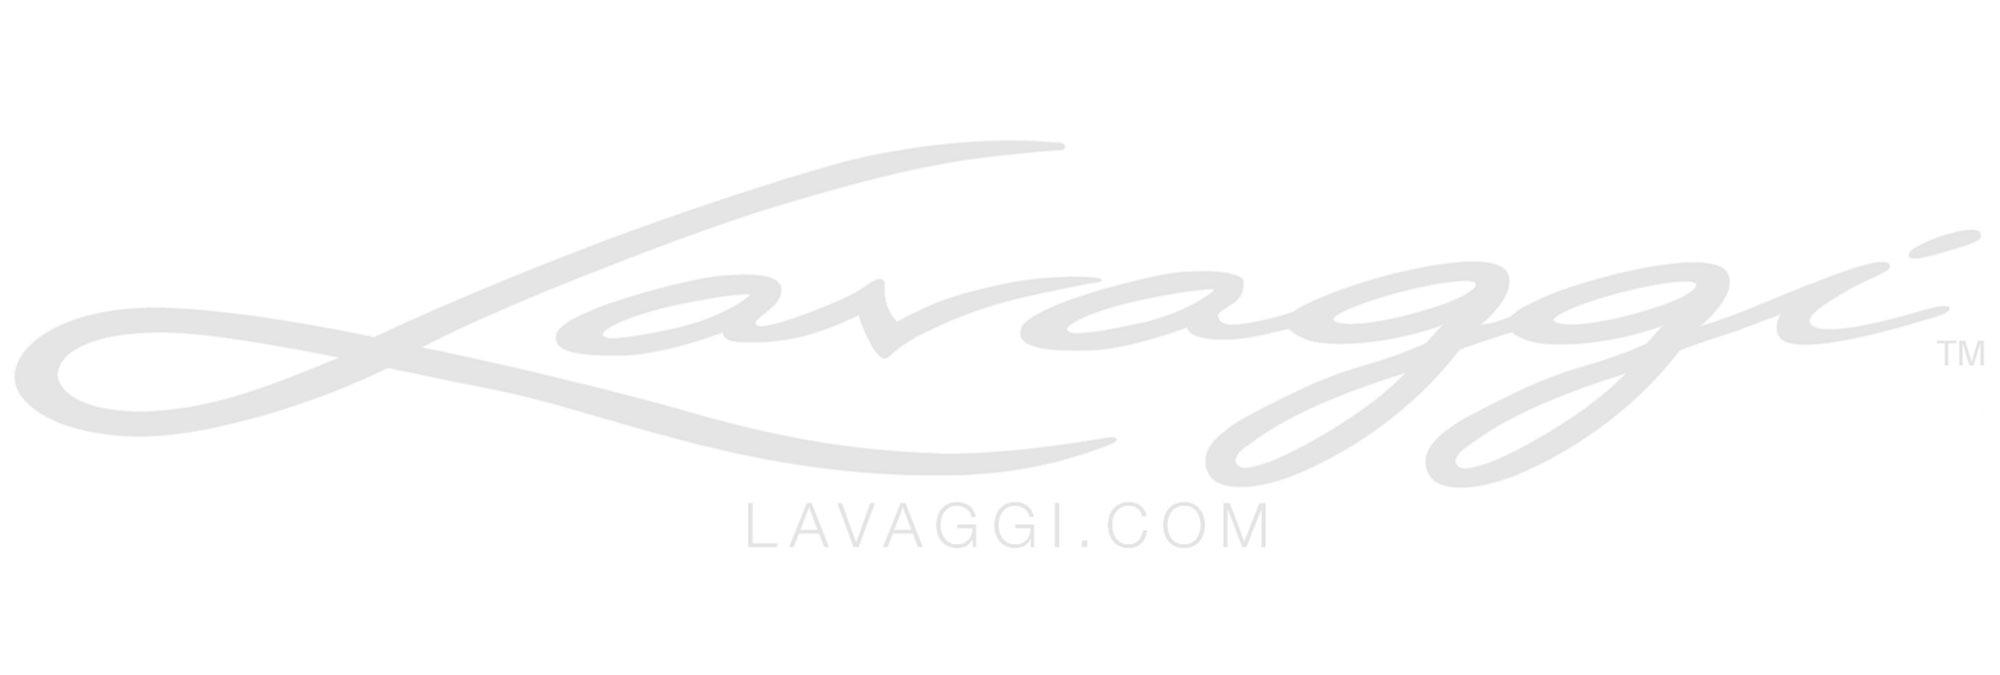 Lavaggi-Logo-TM12